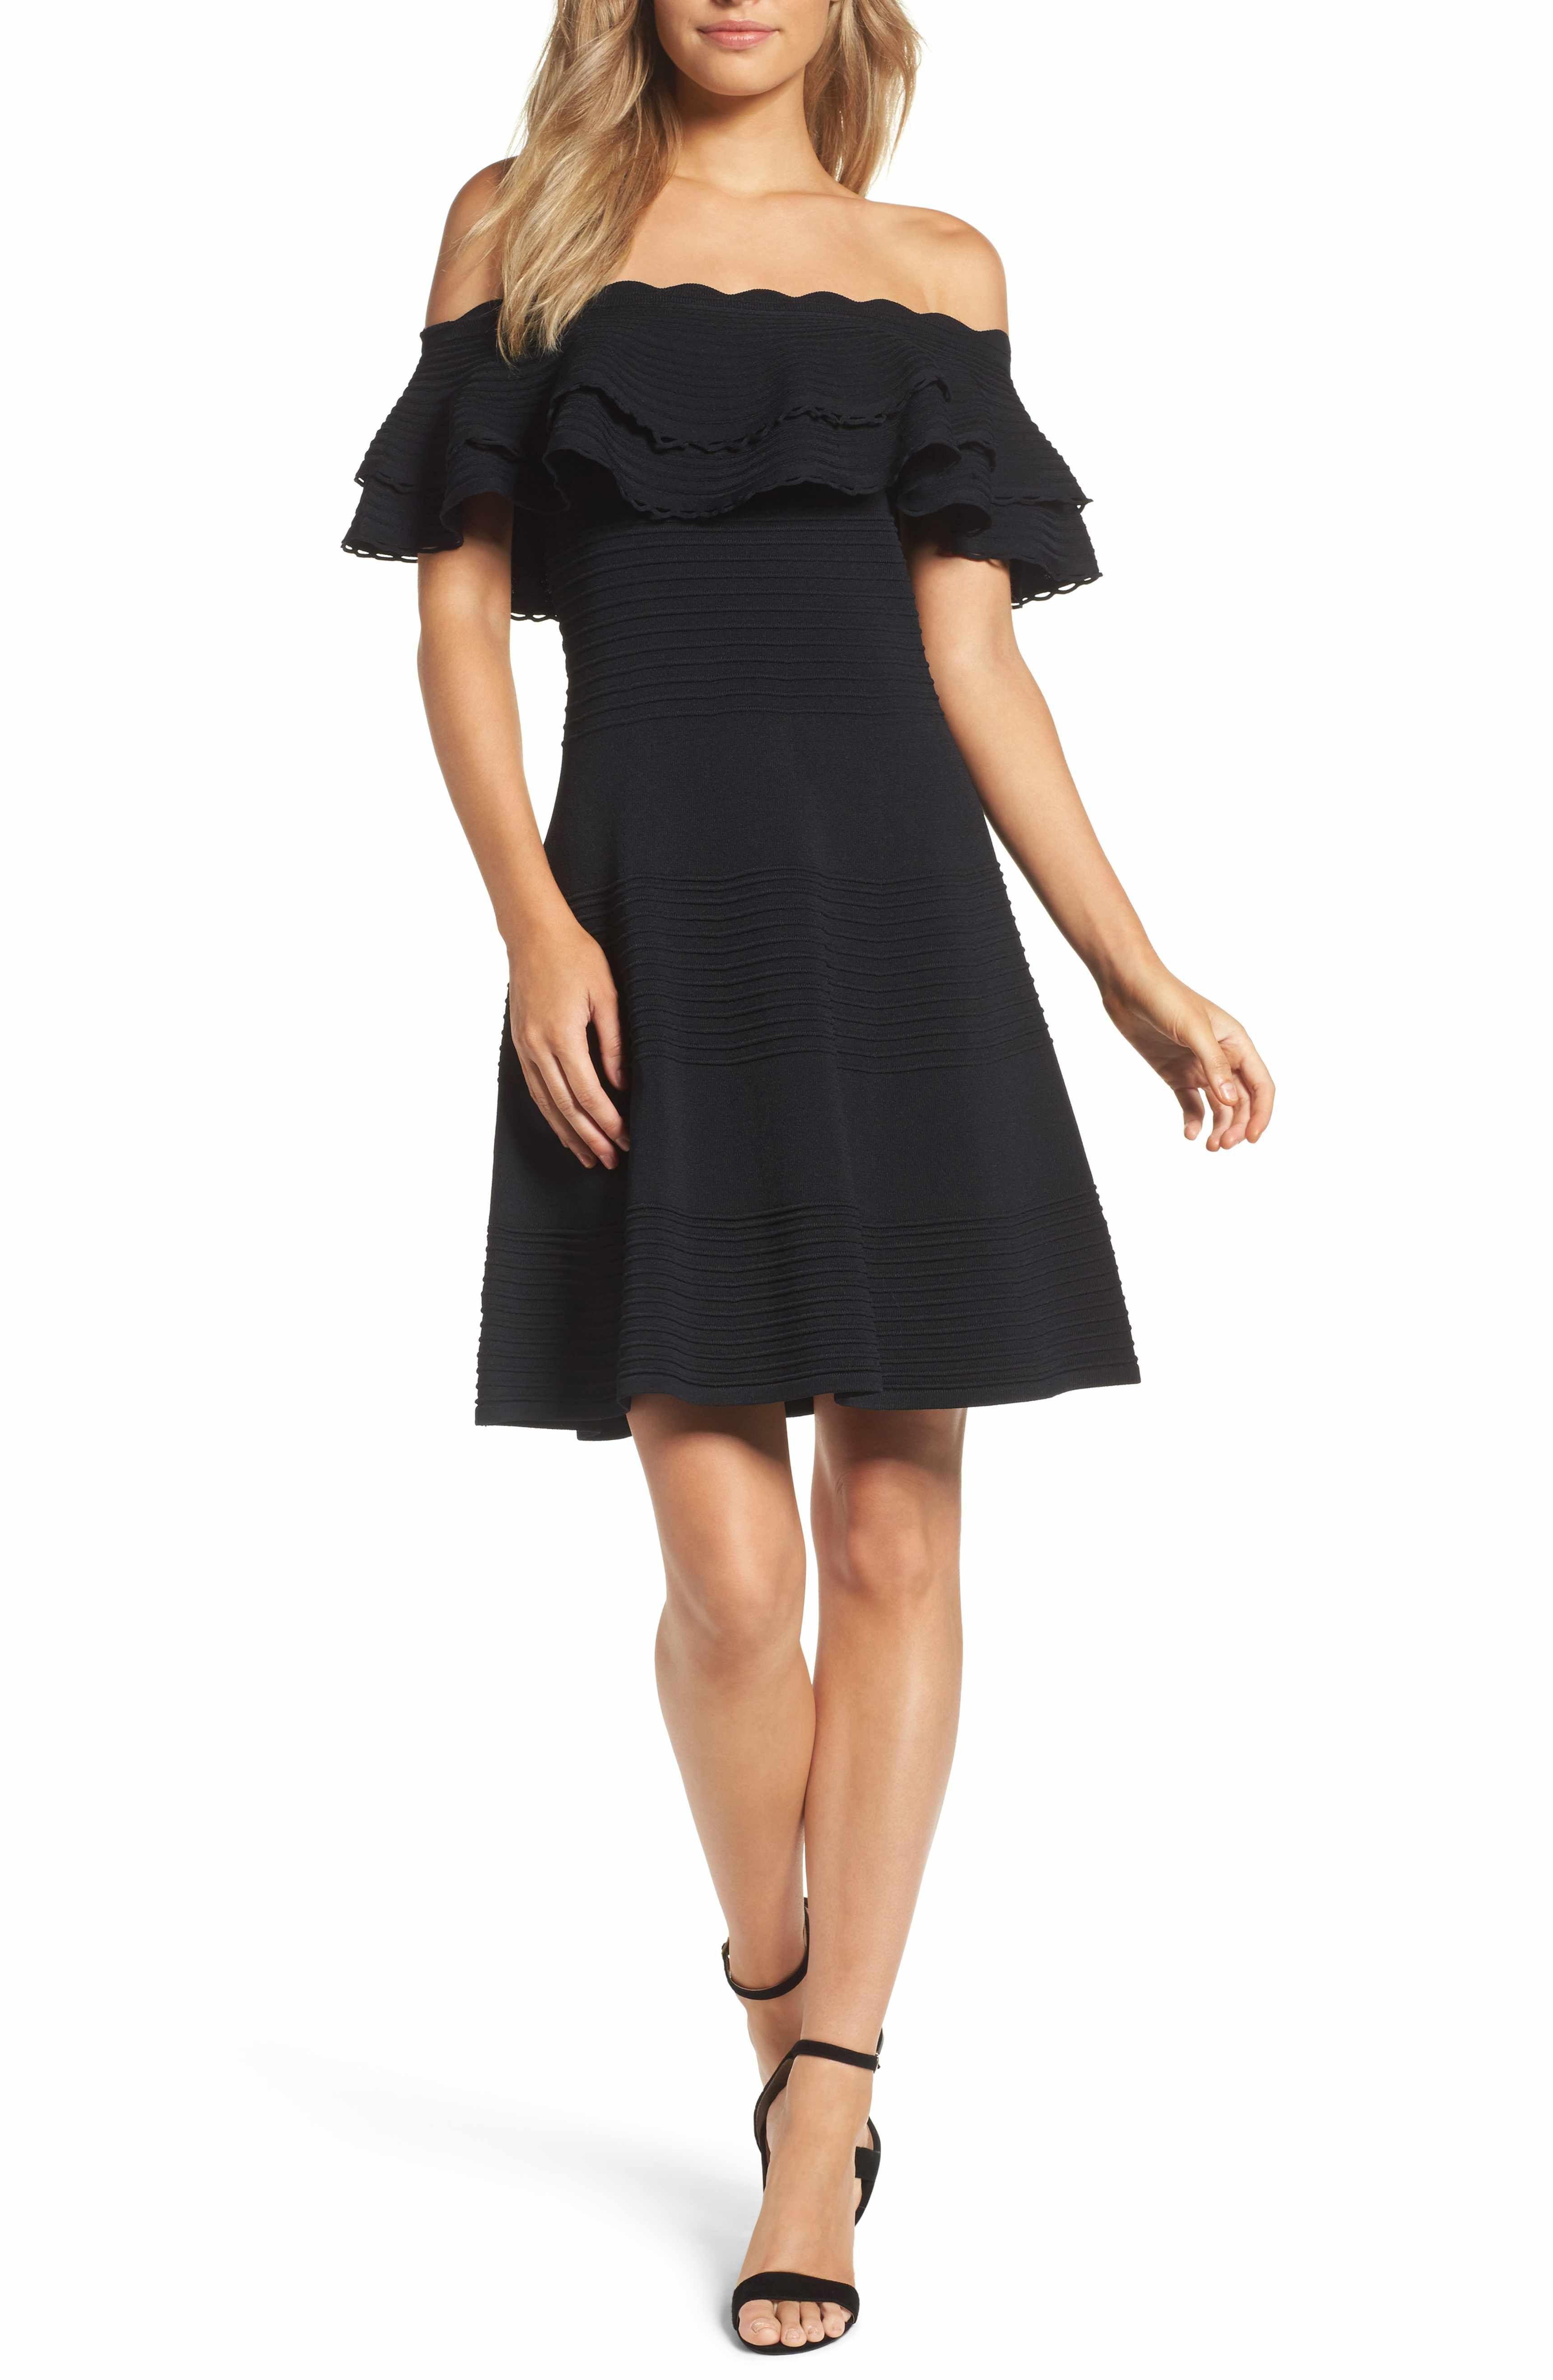 6d7a909e32a7c Main Image - Eliza J Off the Shoulder Fit   Flare Dress (Regular   Petite)